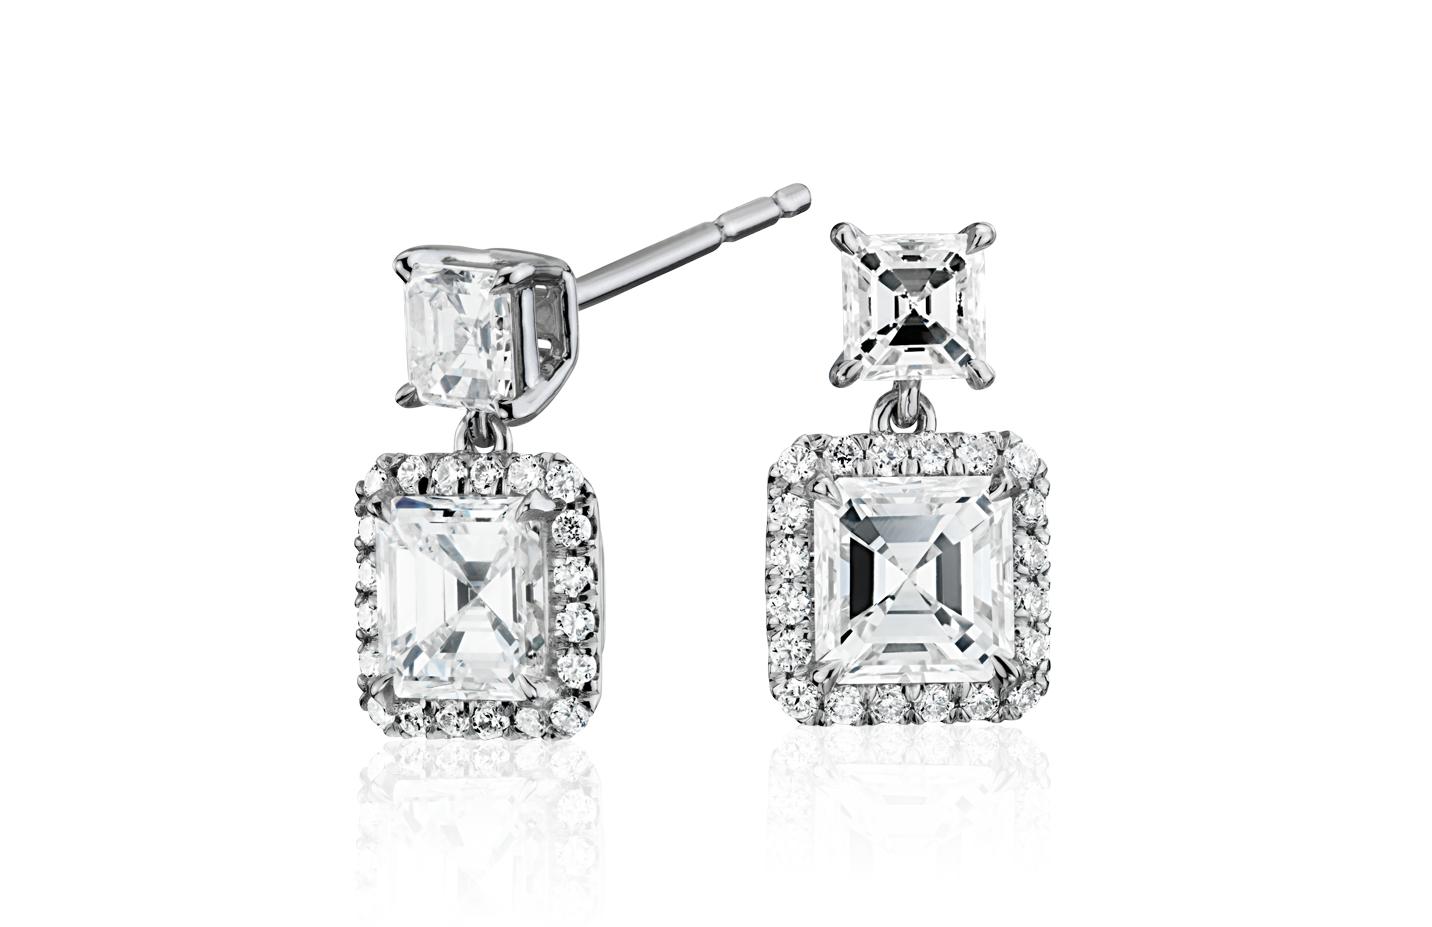 Aretes colgantes con diamantes de talla Asscher en oro blanco de 18 k (1,50 qt. total)